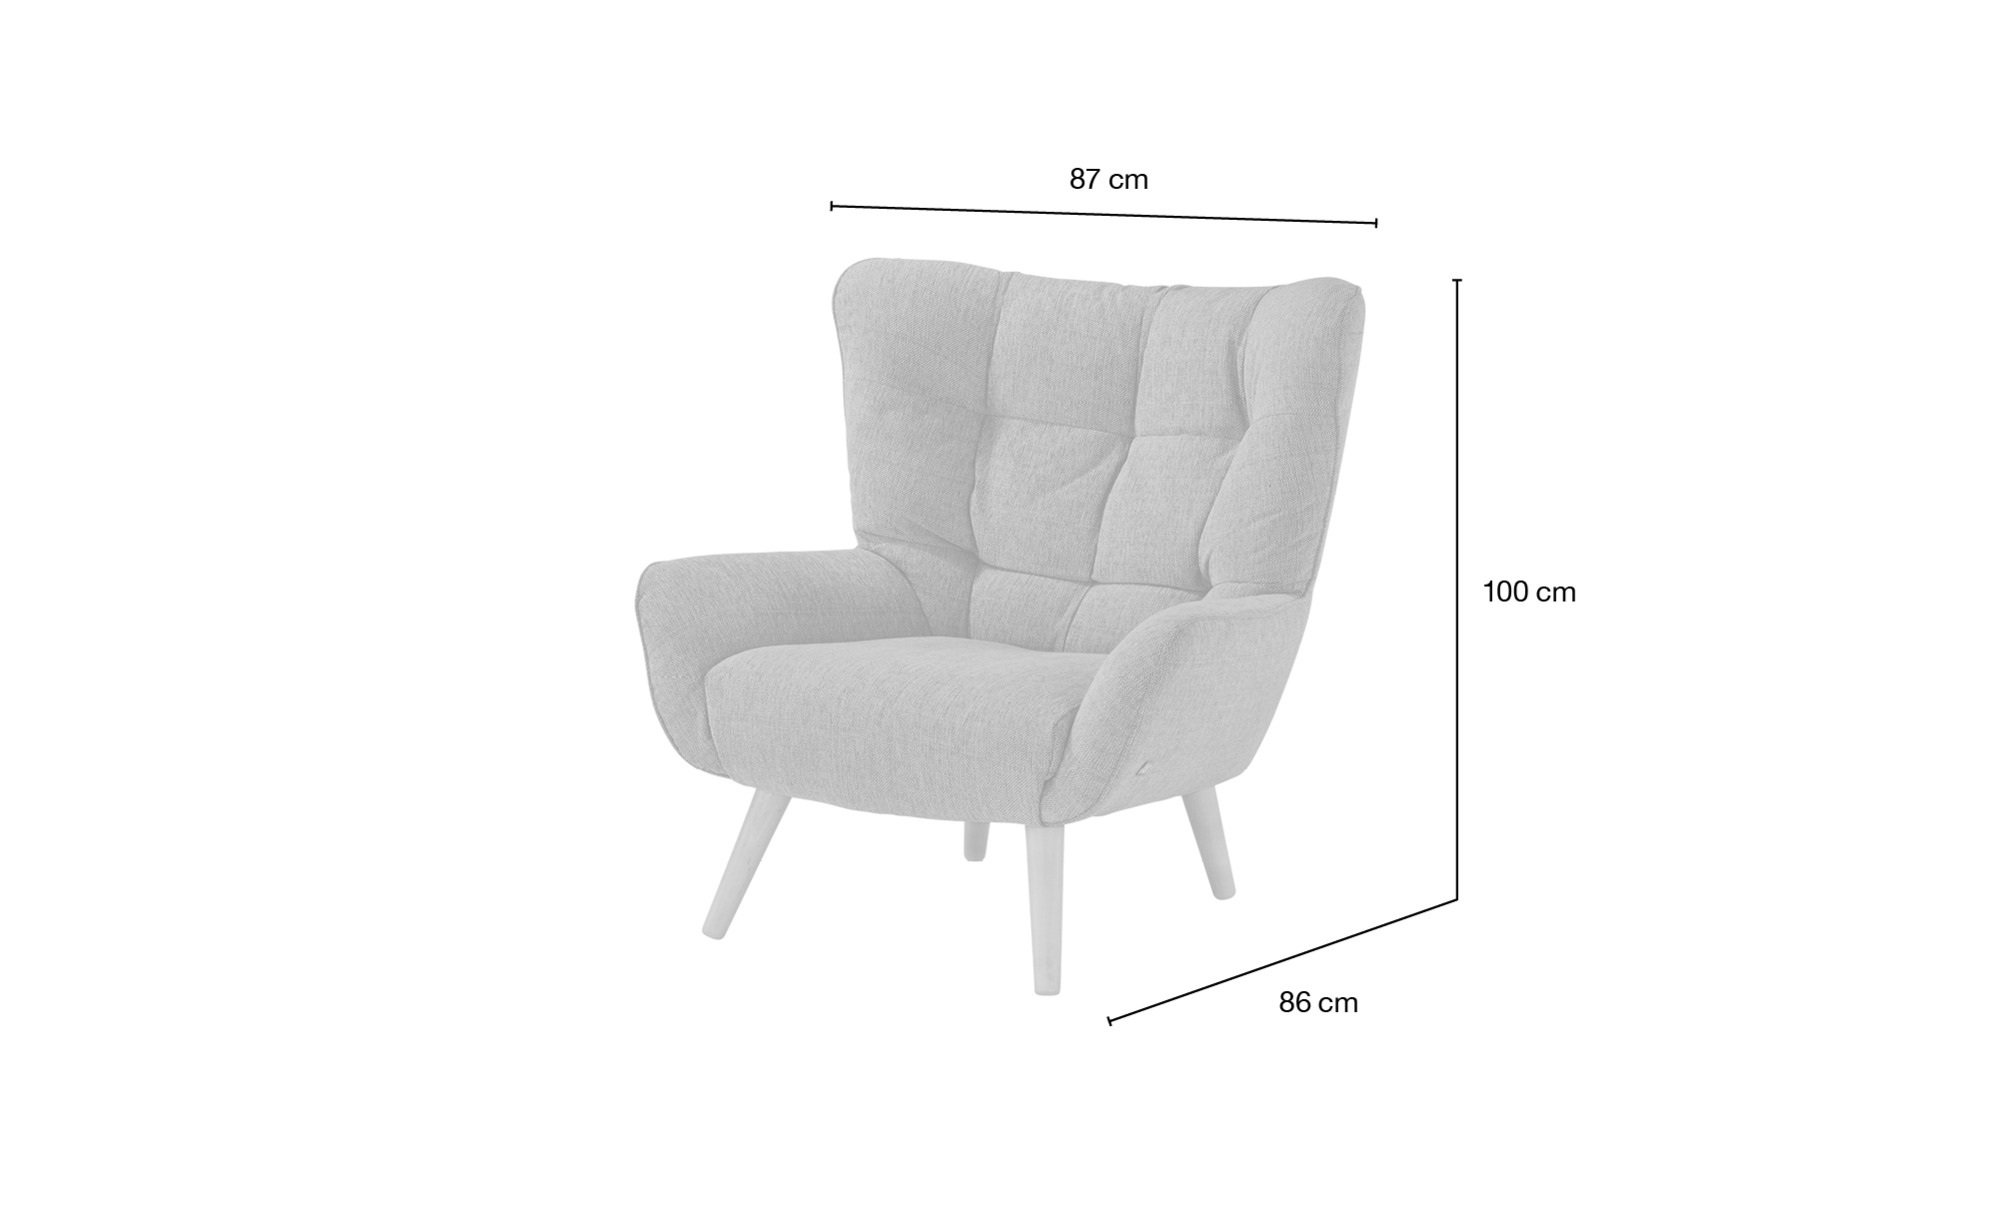 SOHO Polstersessel  Jolyn ¦ grau ¦ Maße (cm): B: 87 H: 100 T: 86 Polstermöbel > Sessel > Ohrensessel - Höffner